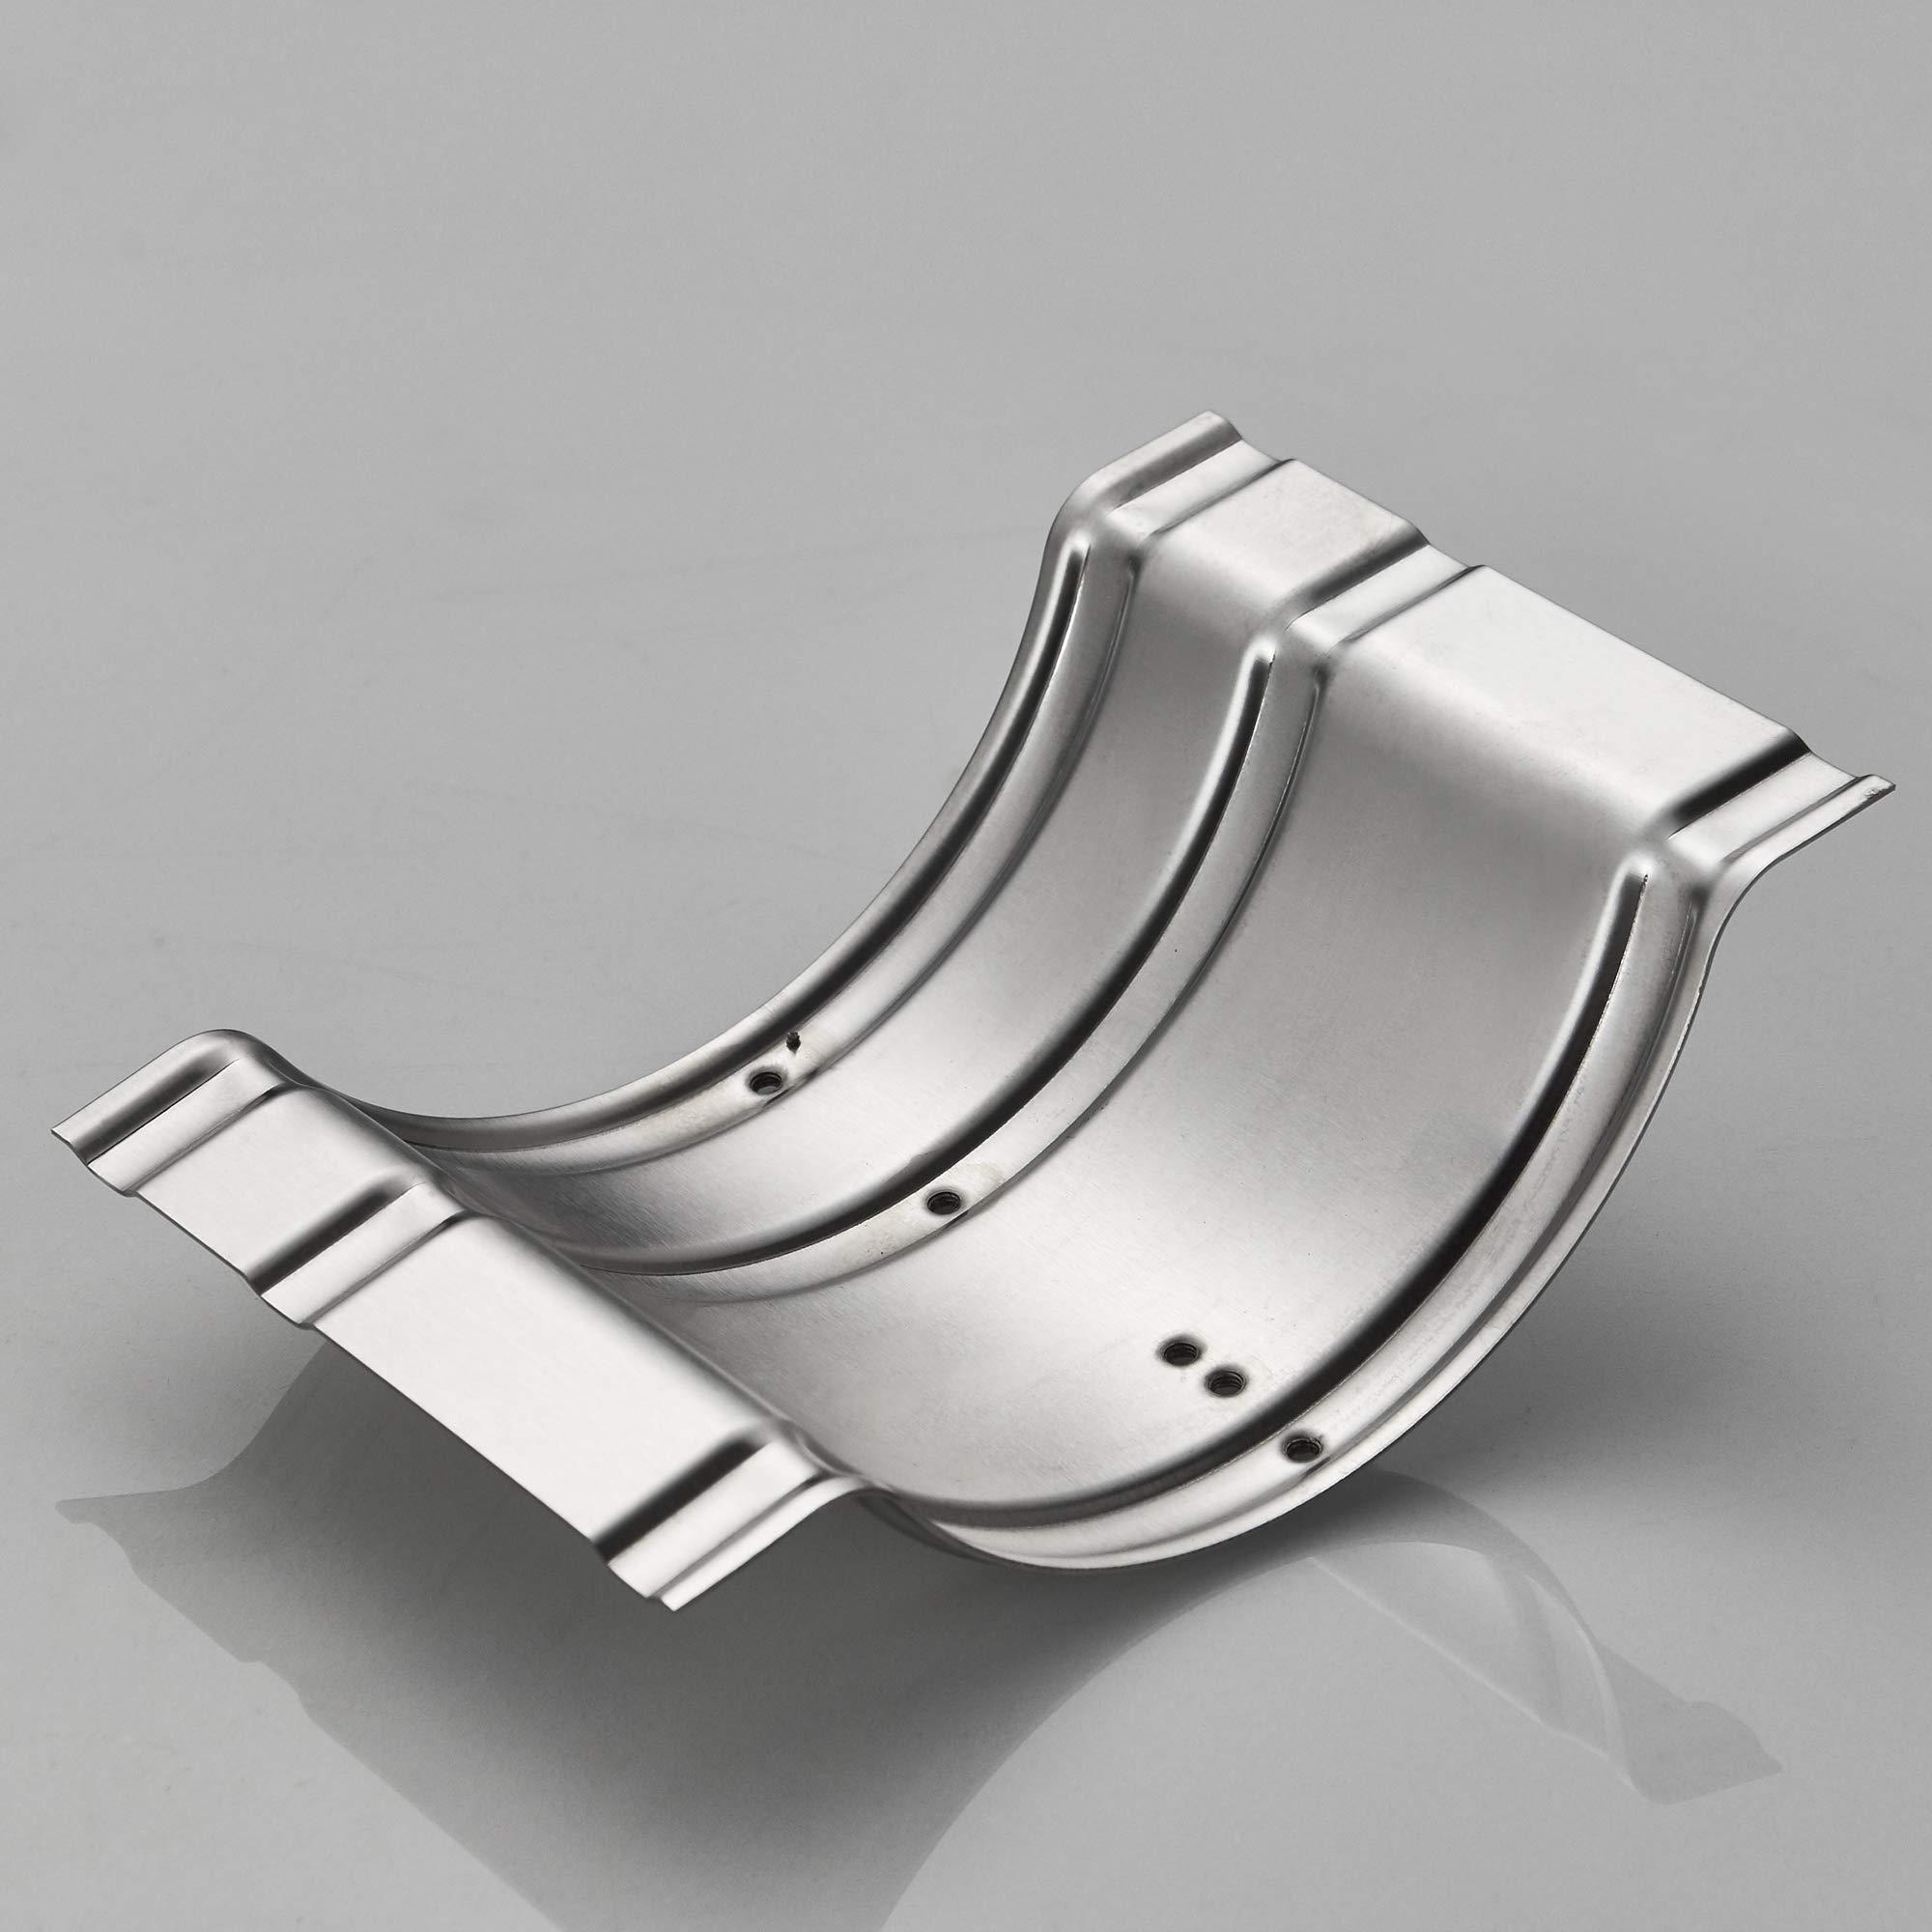 JunSun Brushed Nickel Recessed Toilet Paper Holder Wall Toilet Paper Holder Recessed Toilet Tissue Holder Stainless Steel Toilet Paper Holder Rear Mounting Bracket Included by JunSun (Image #8)